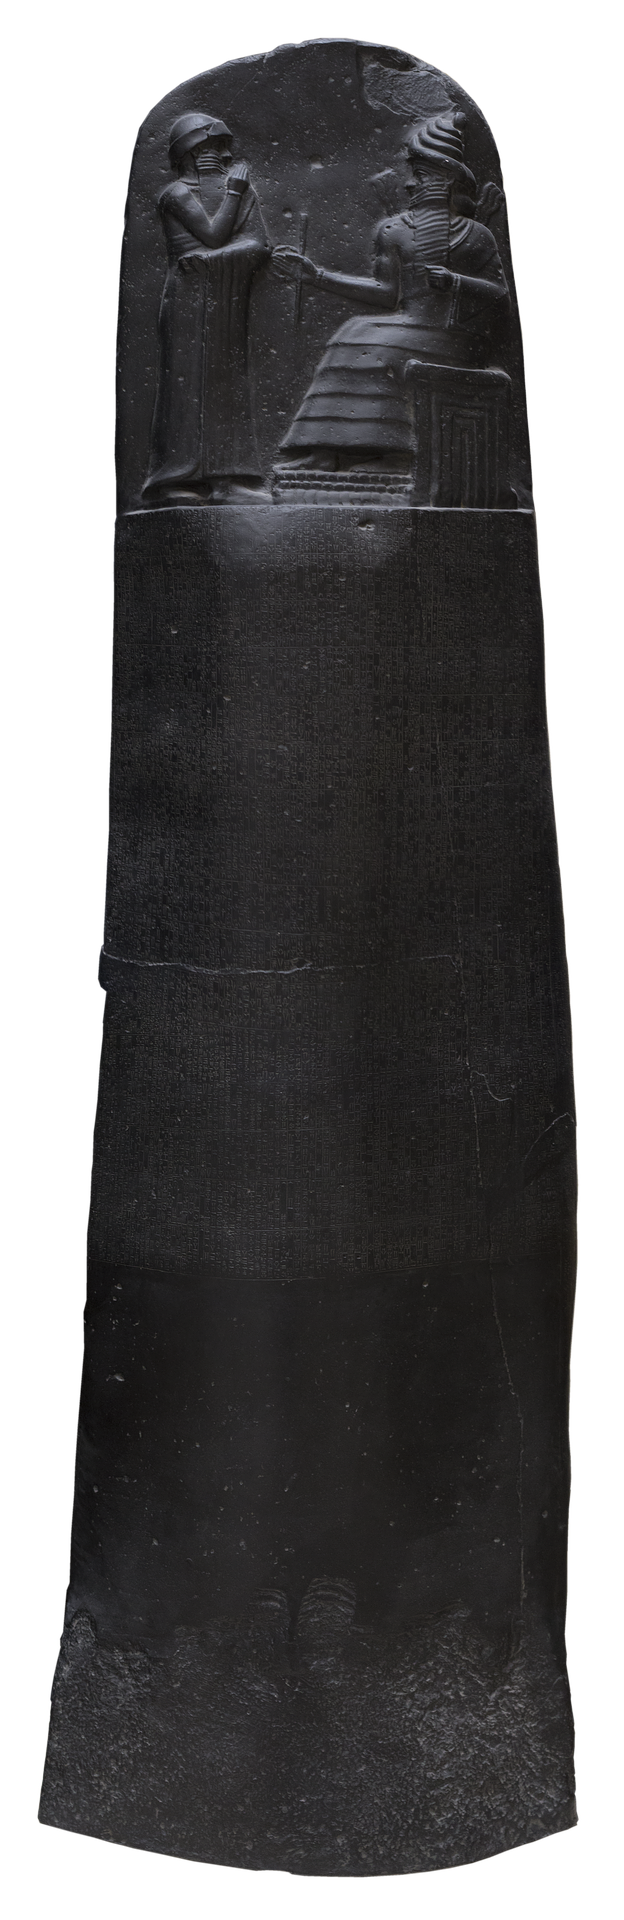 hammurabi-1626388_1920